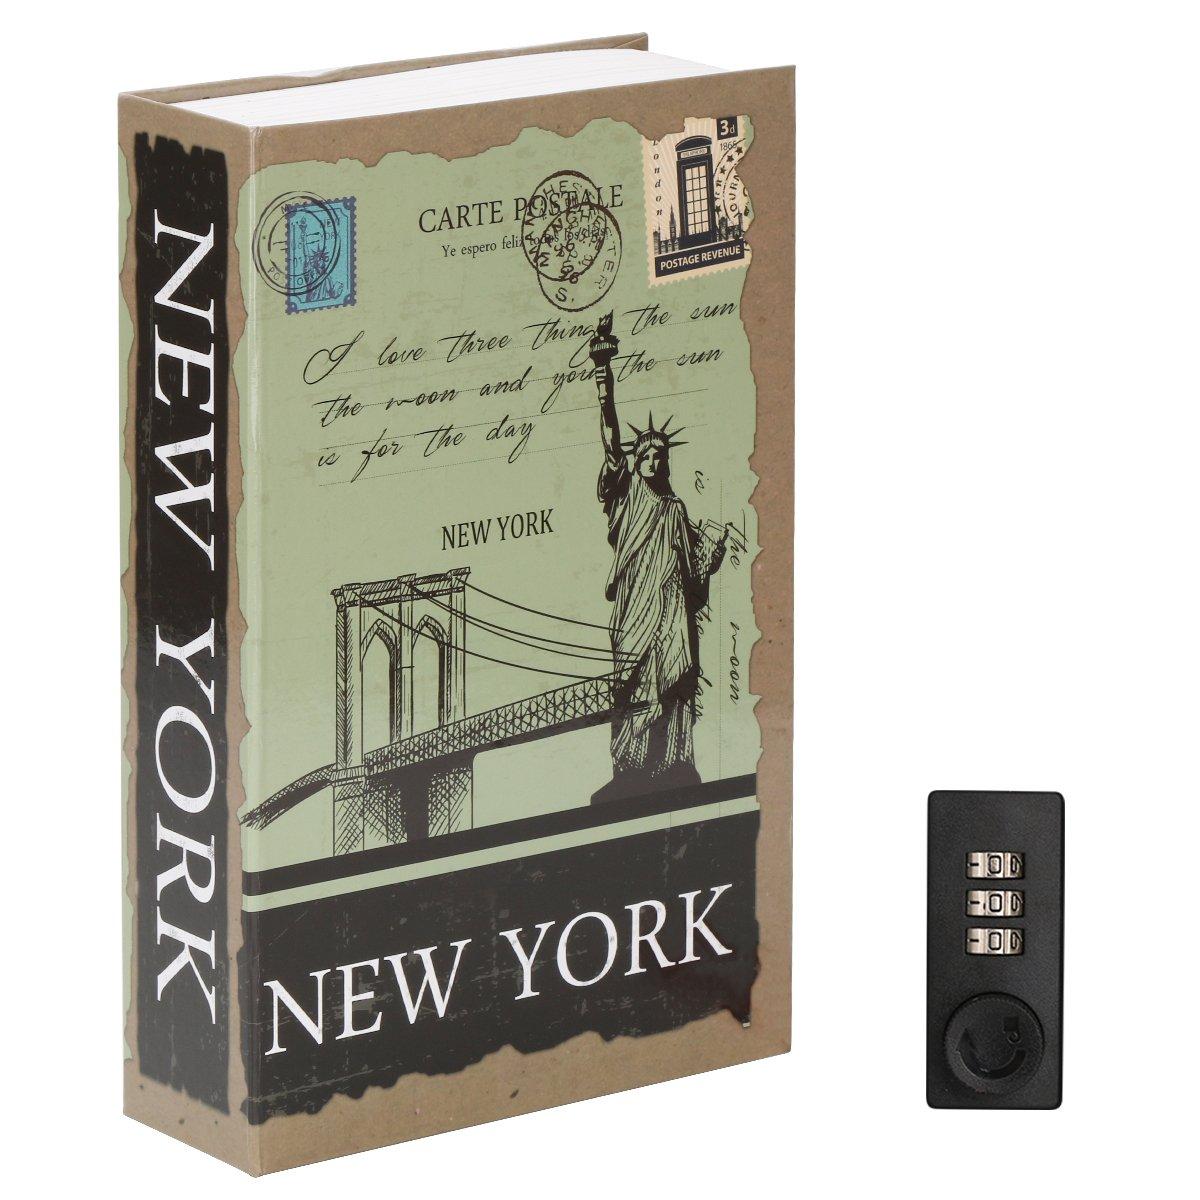 Diversion Book Safe with Combination Lock, Decaller Safe Secret Hidden Metal Lock Box, 9 1/2'' x 6'' x 1 1/3'', New York